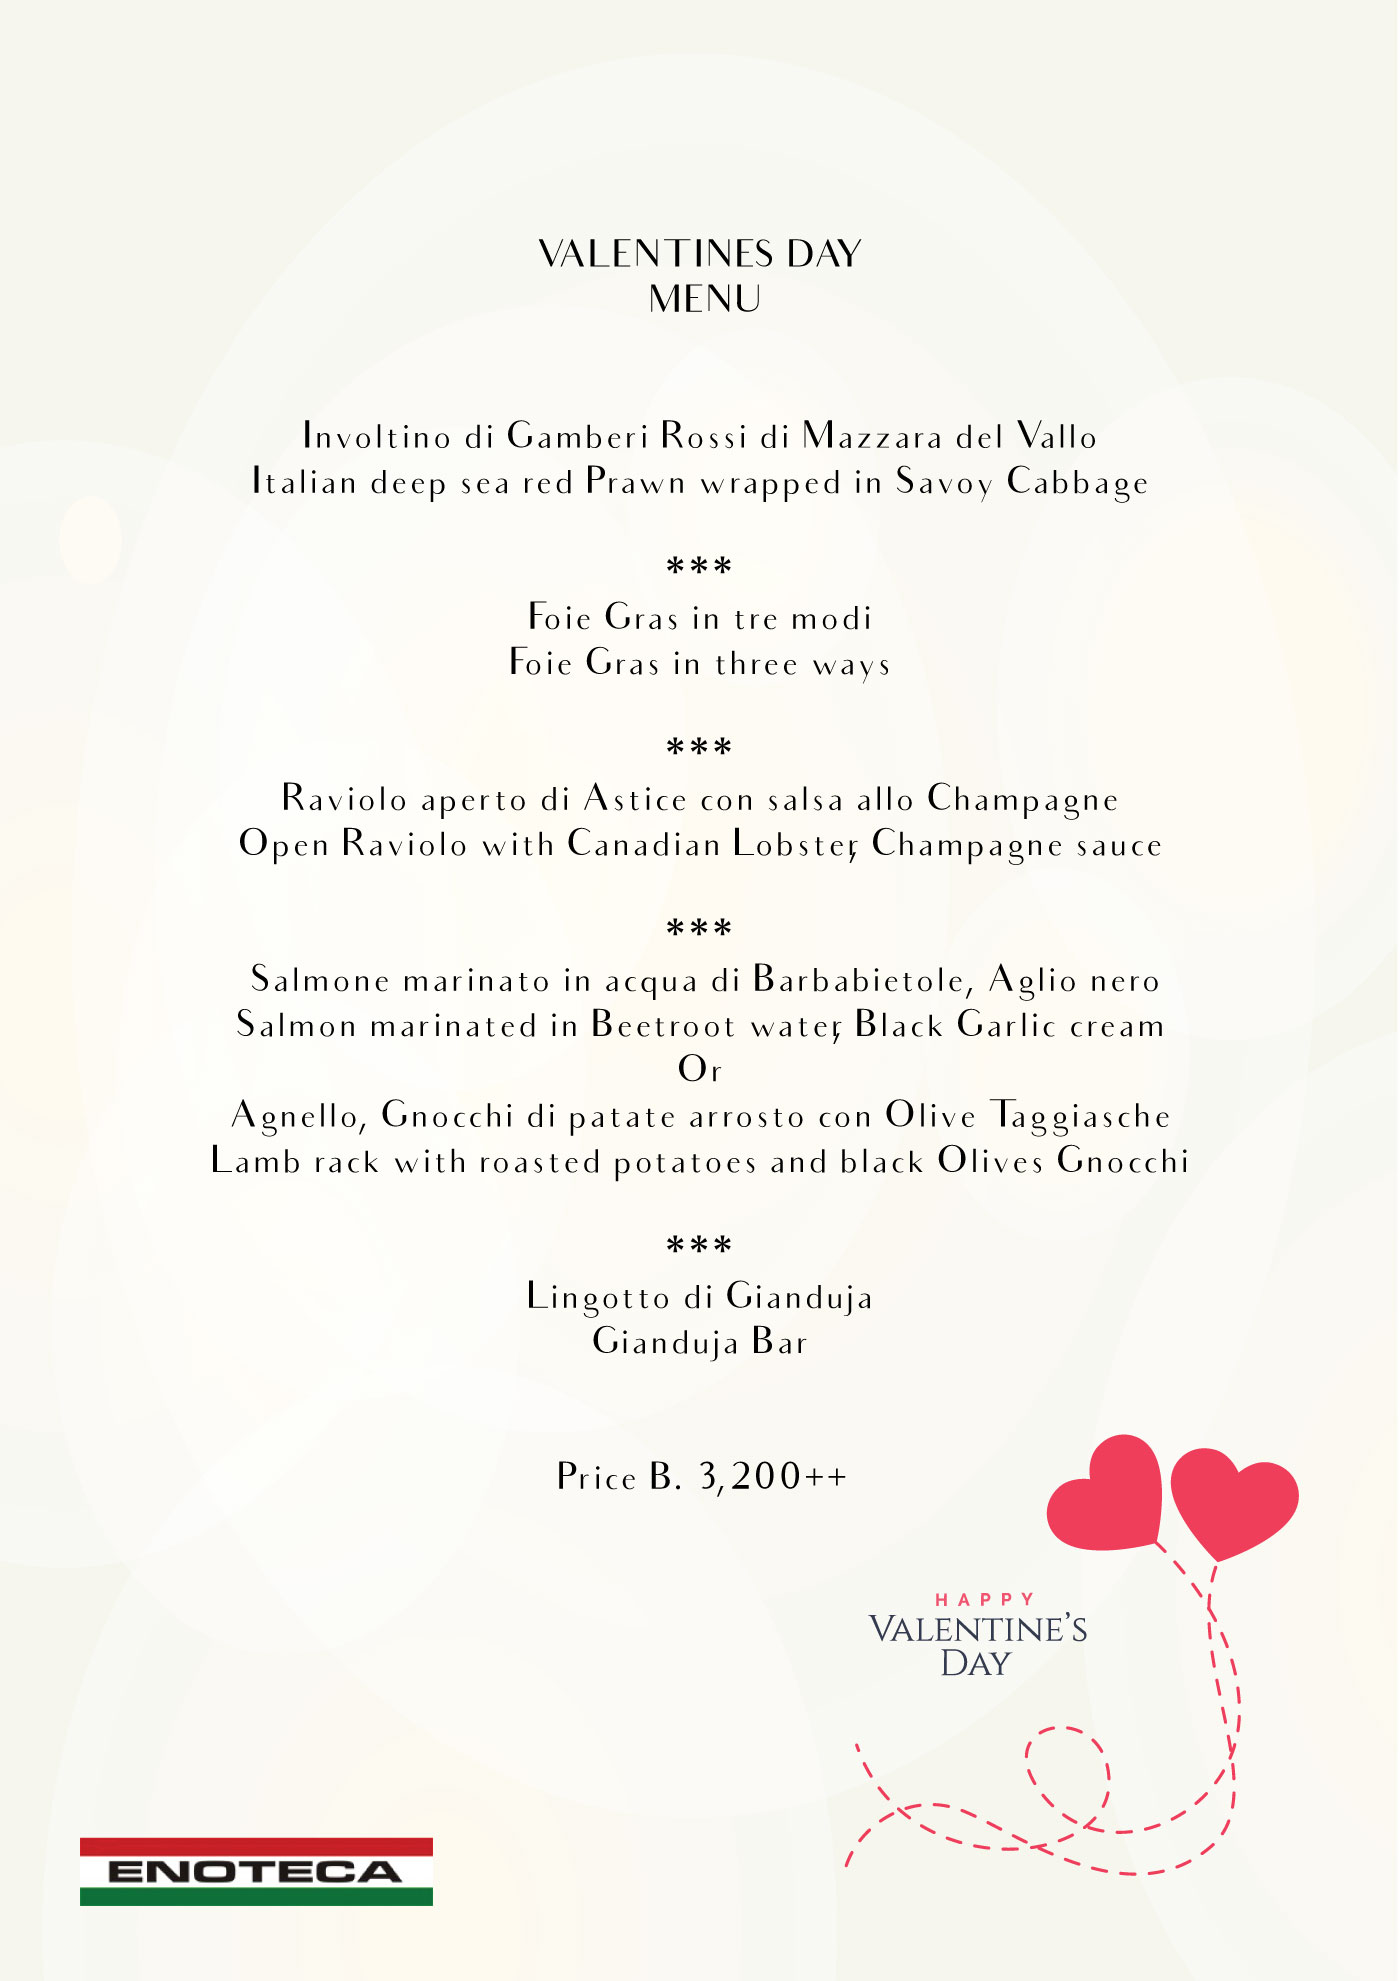 Enoteca Italiana Valentines Menu